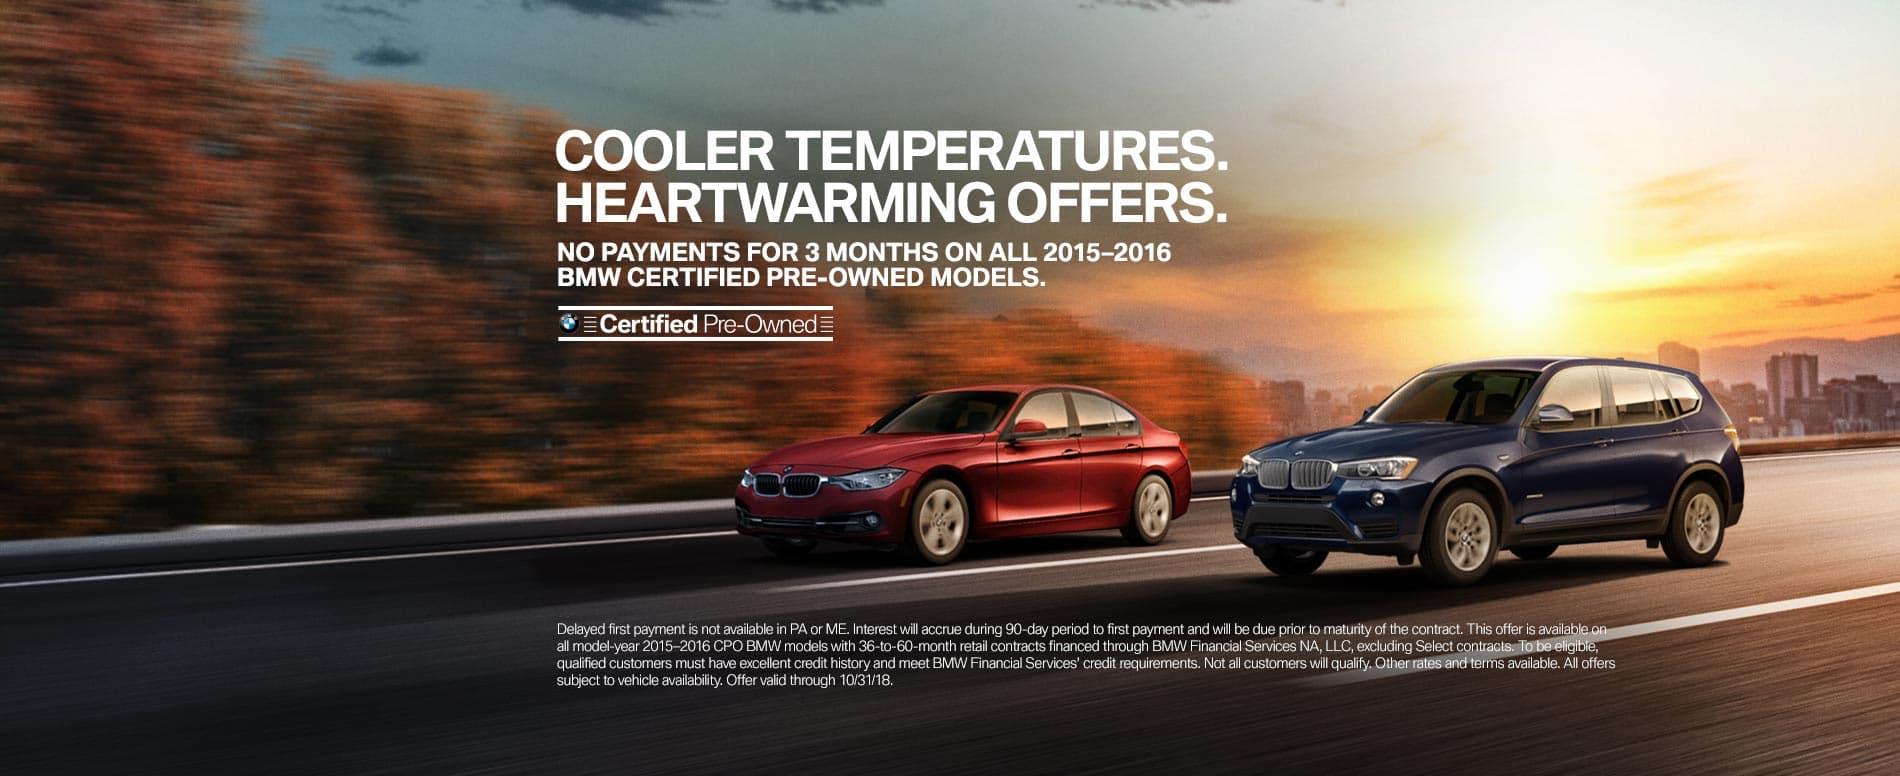 BMW of Ridgefield | BMW Dealer in Ridgefield, CT